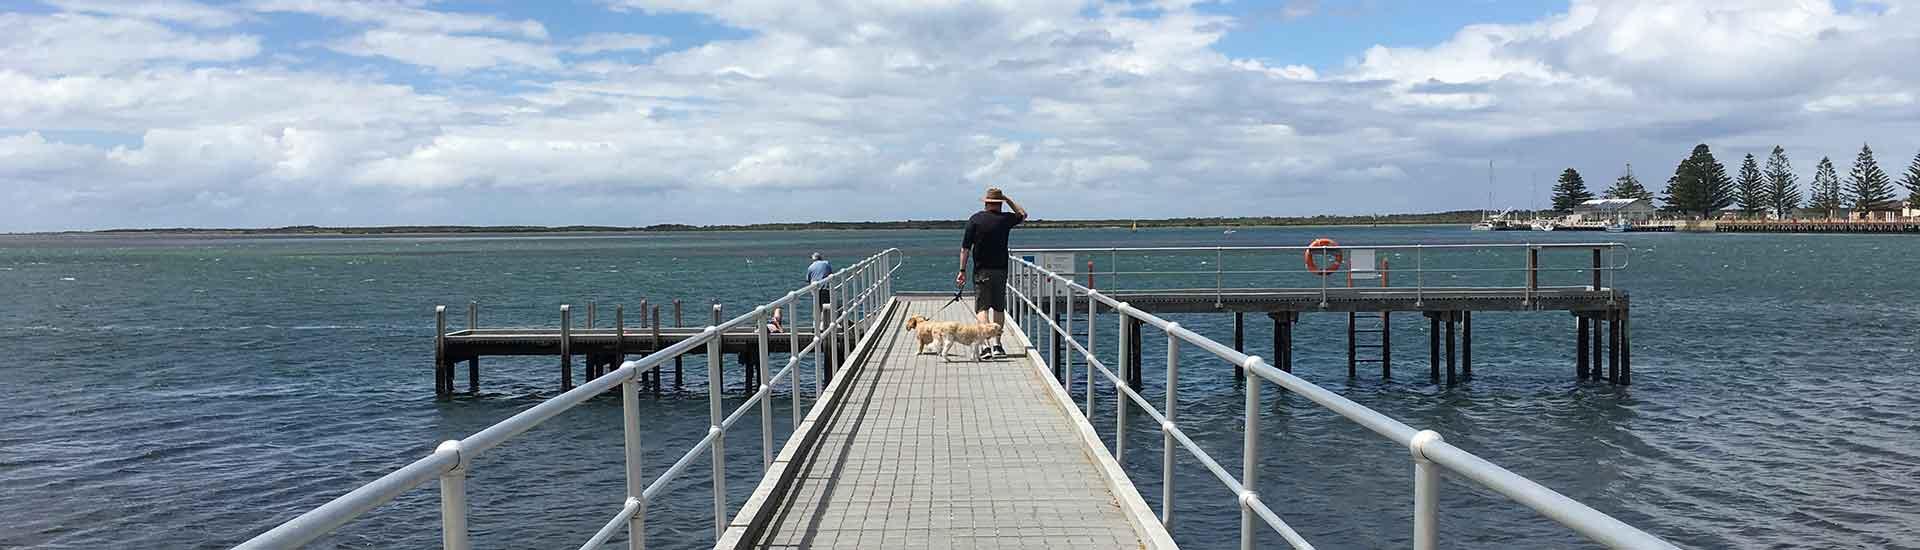 Port Albert Windy Day